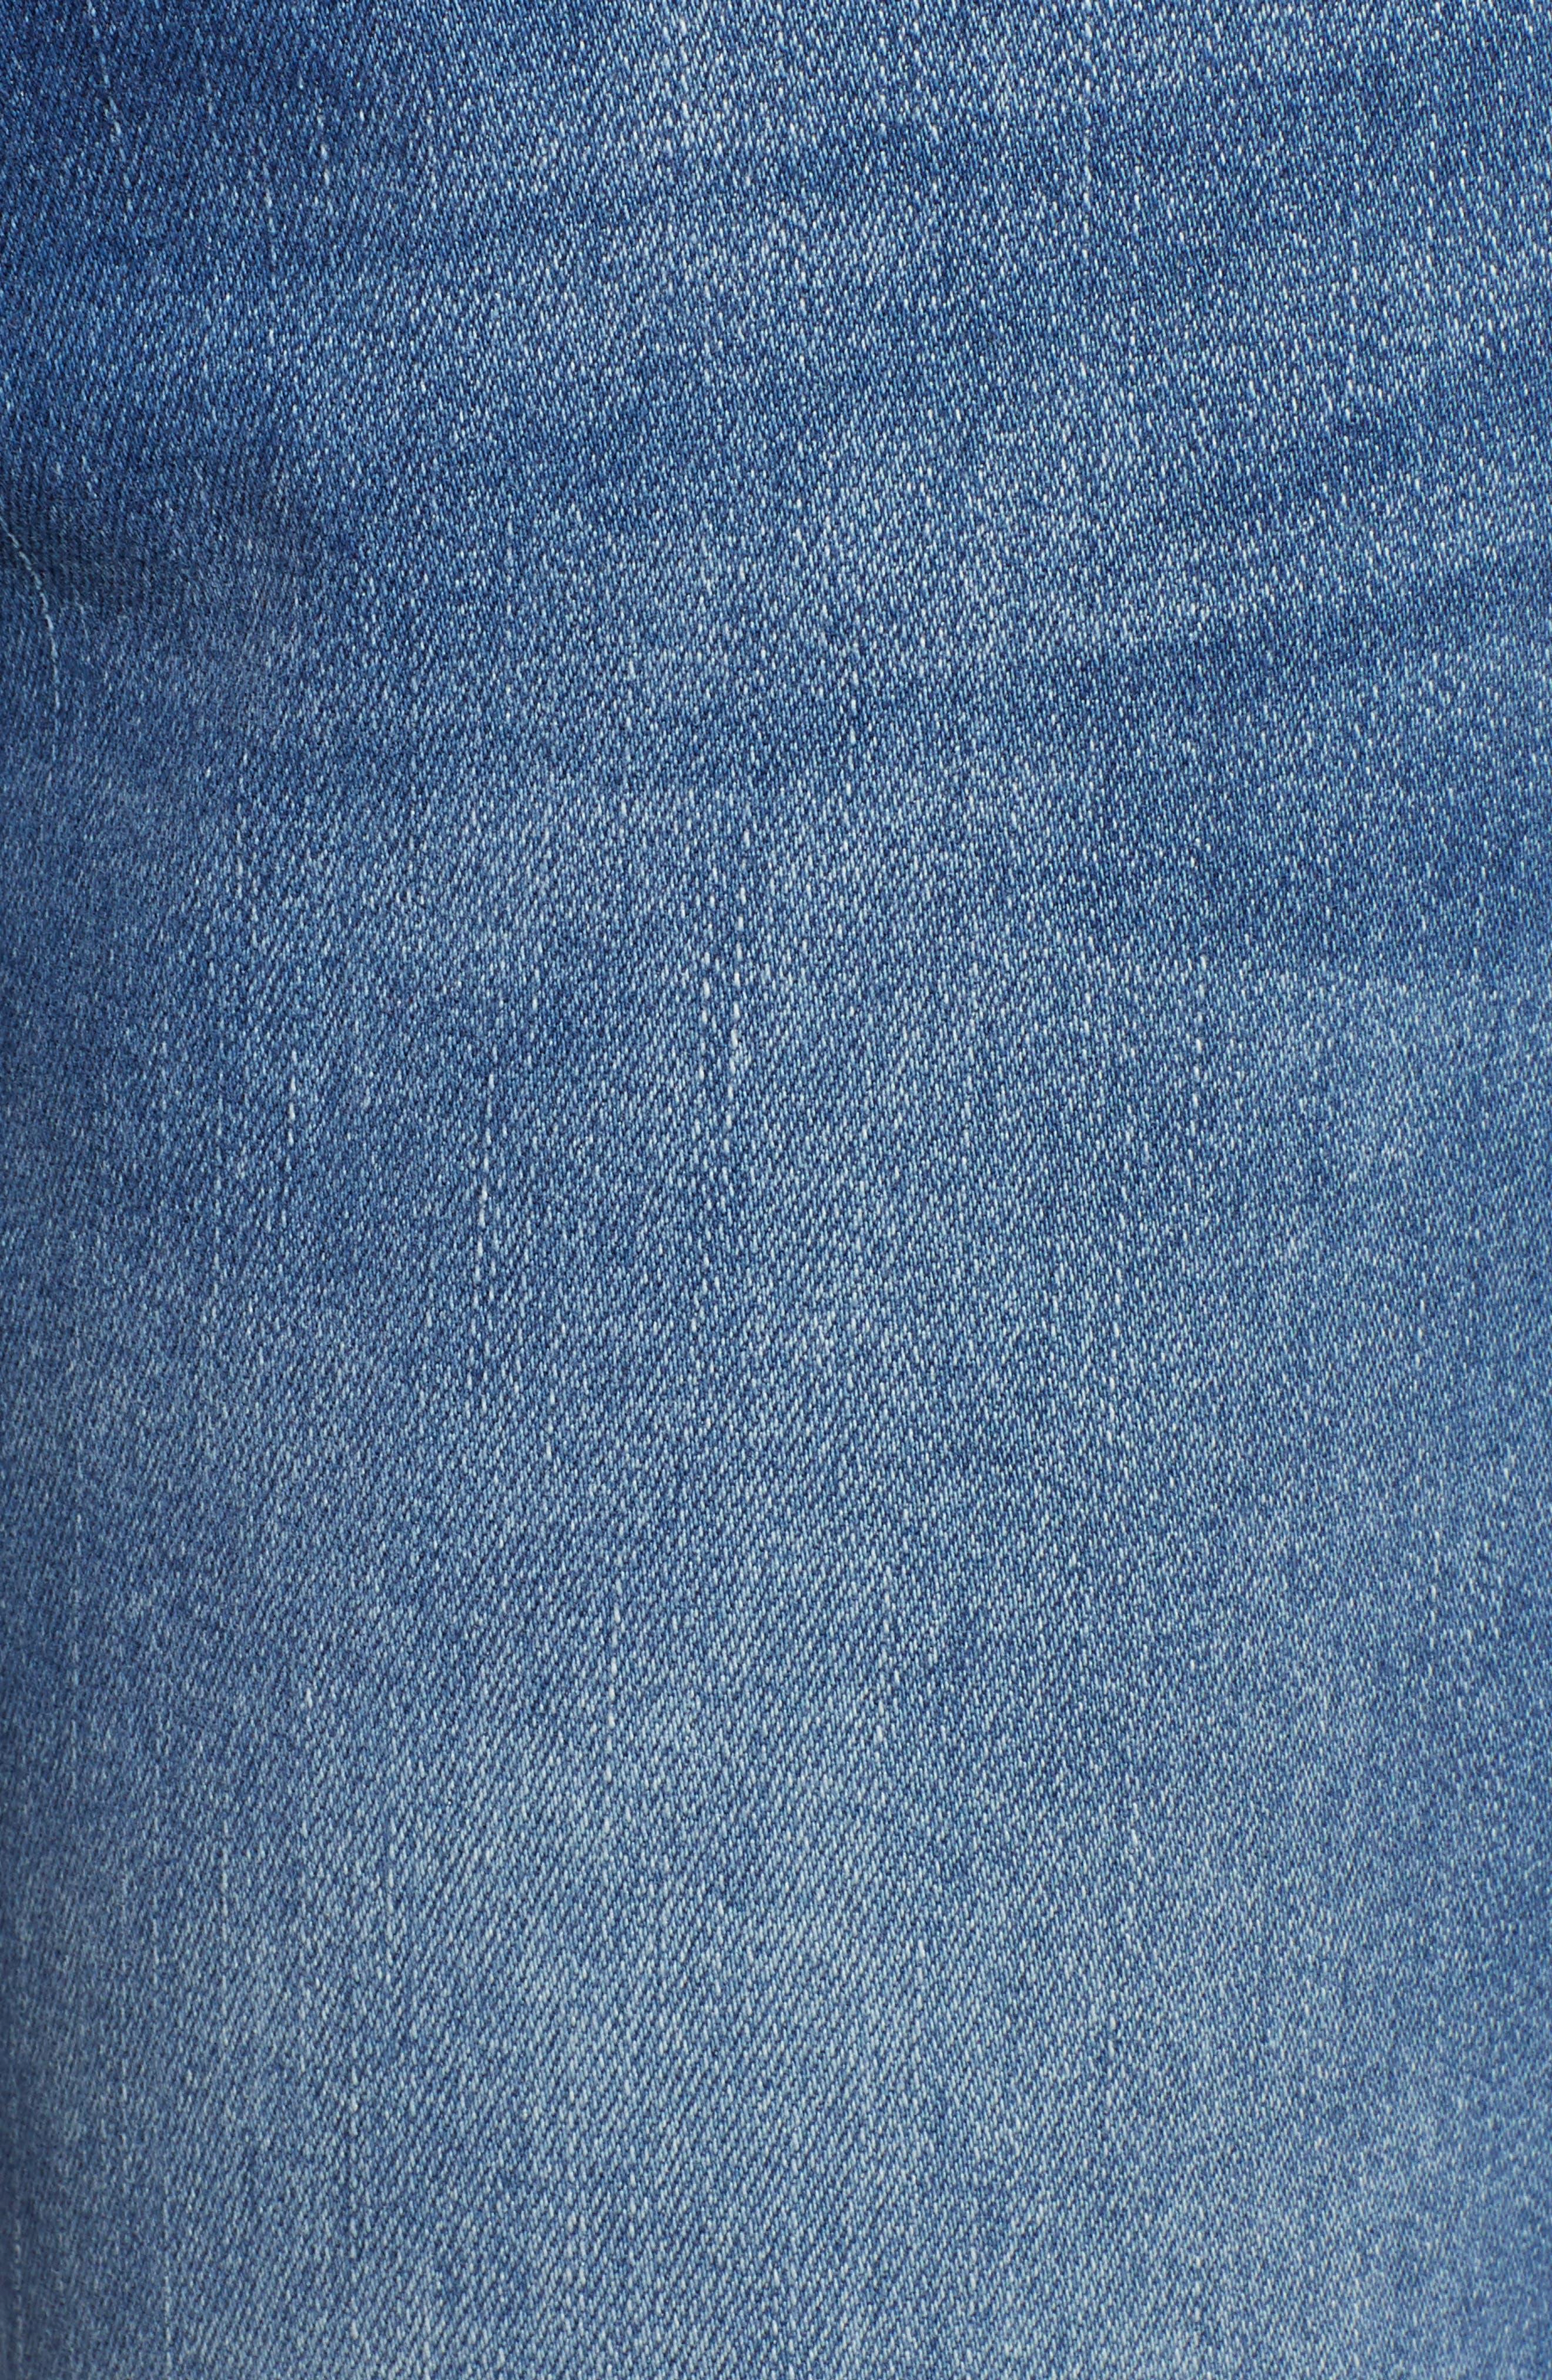 Tema Slim Boyfriend Jeans,                             Alternate thumbnail 6, color,                             407